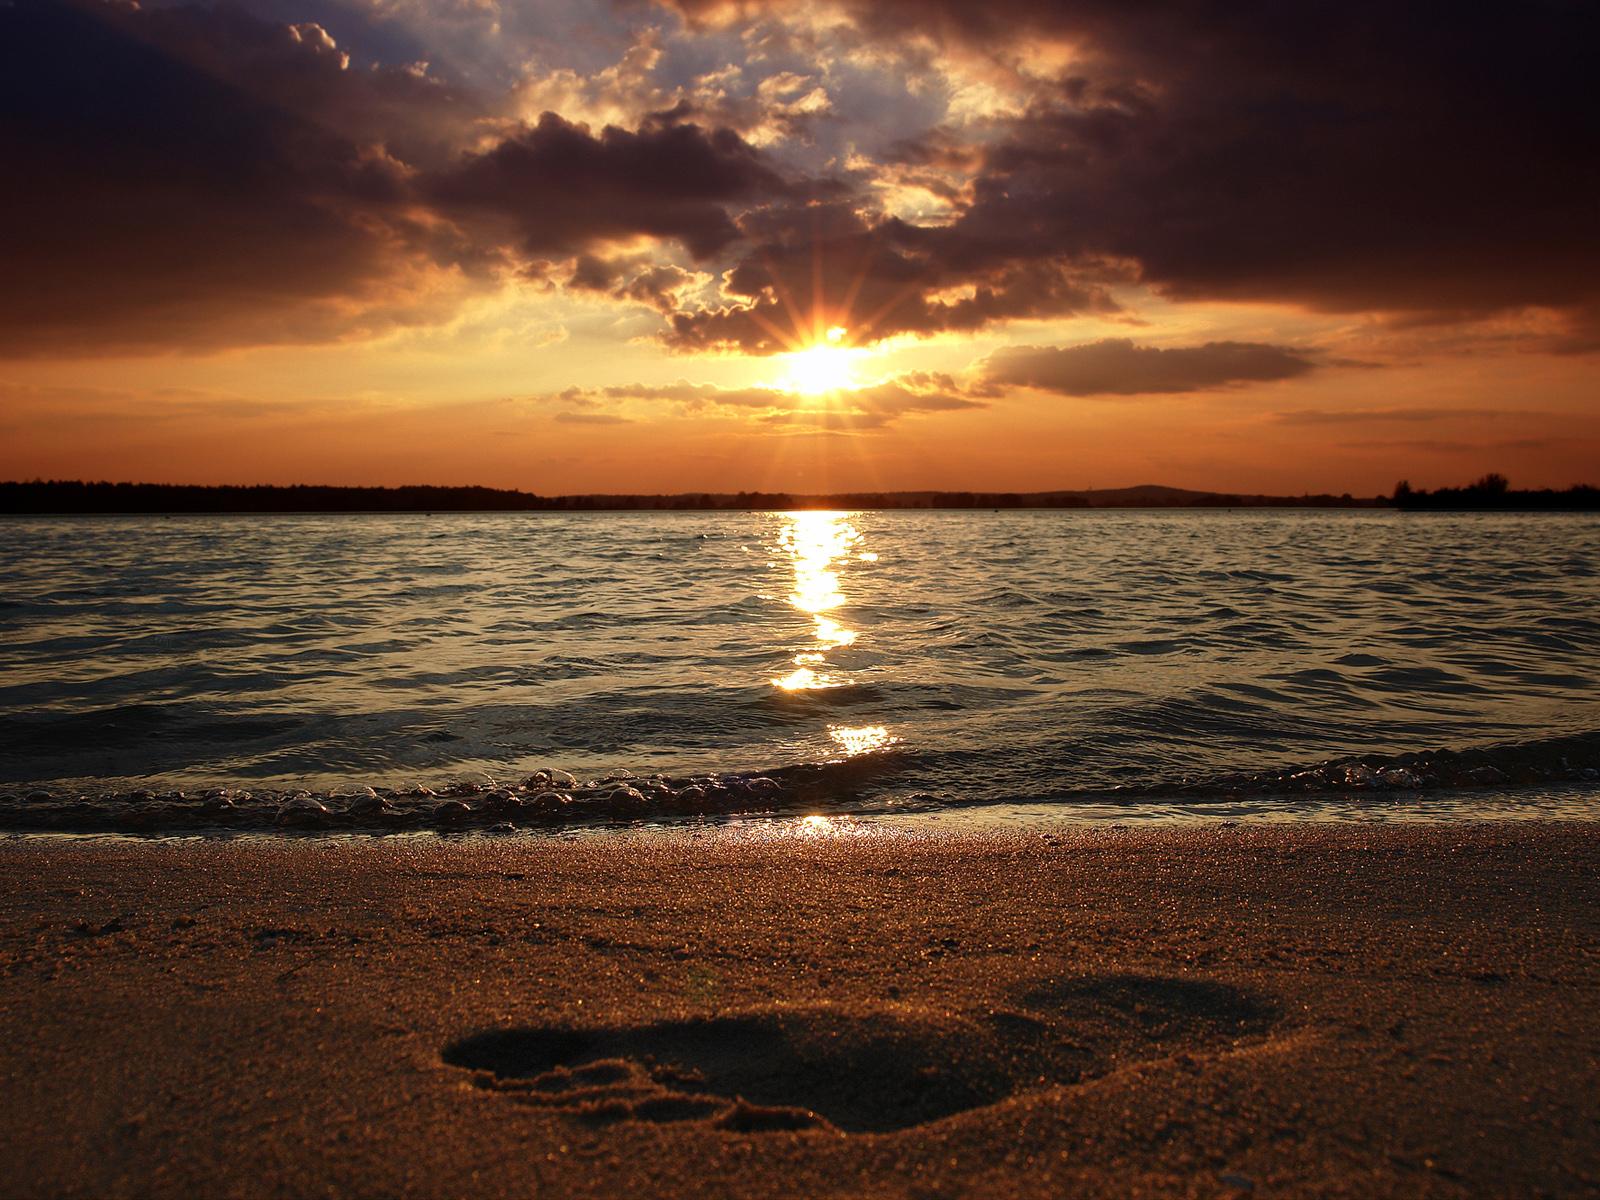 refletindo na praia papel - photo #34